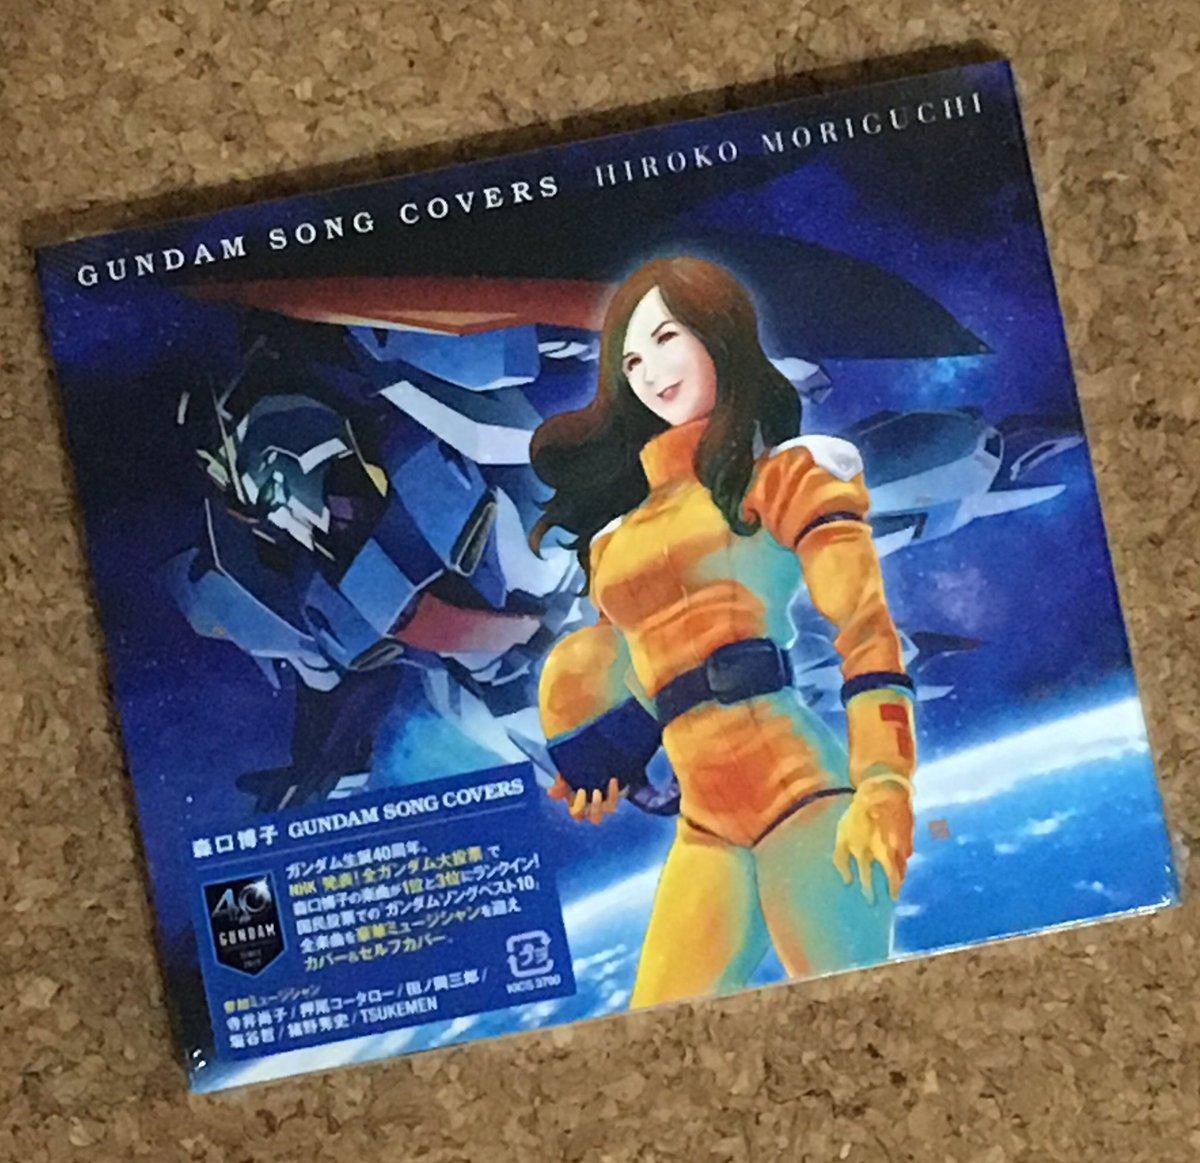 GUNDAM SONG COVERSに関する画像40